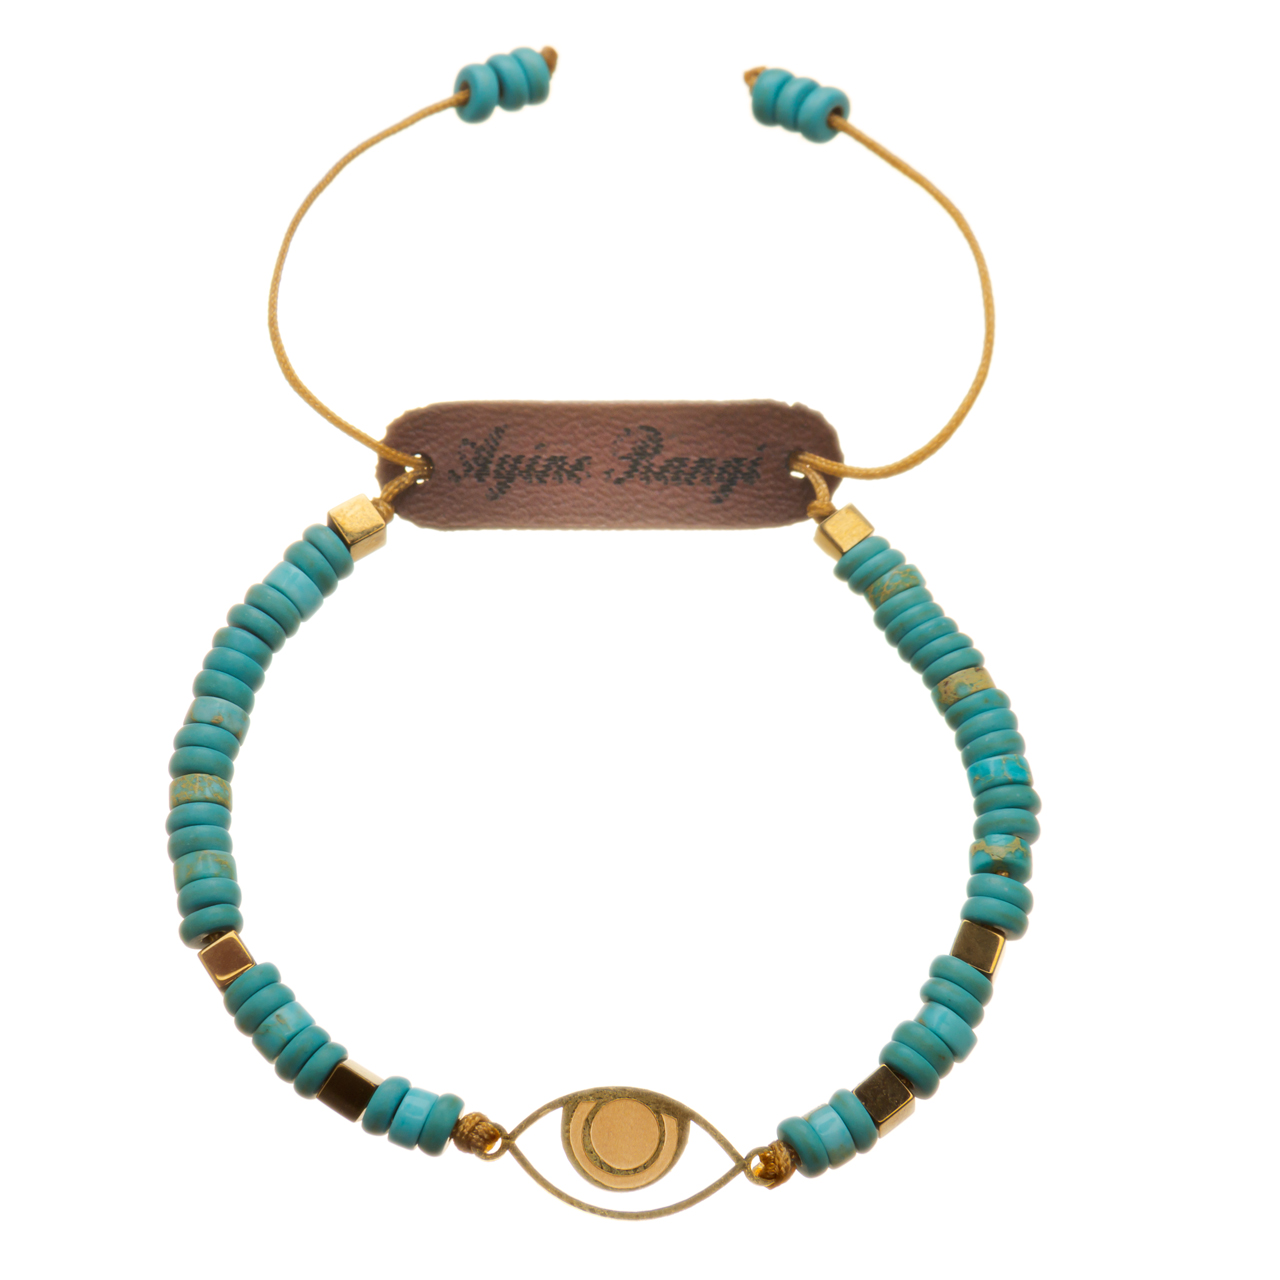 دستبند طلا 18 عیار آیینه رنگی طرح چشم کد AR-A05